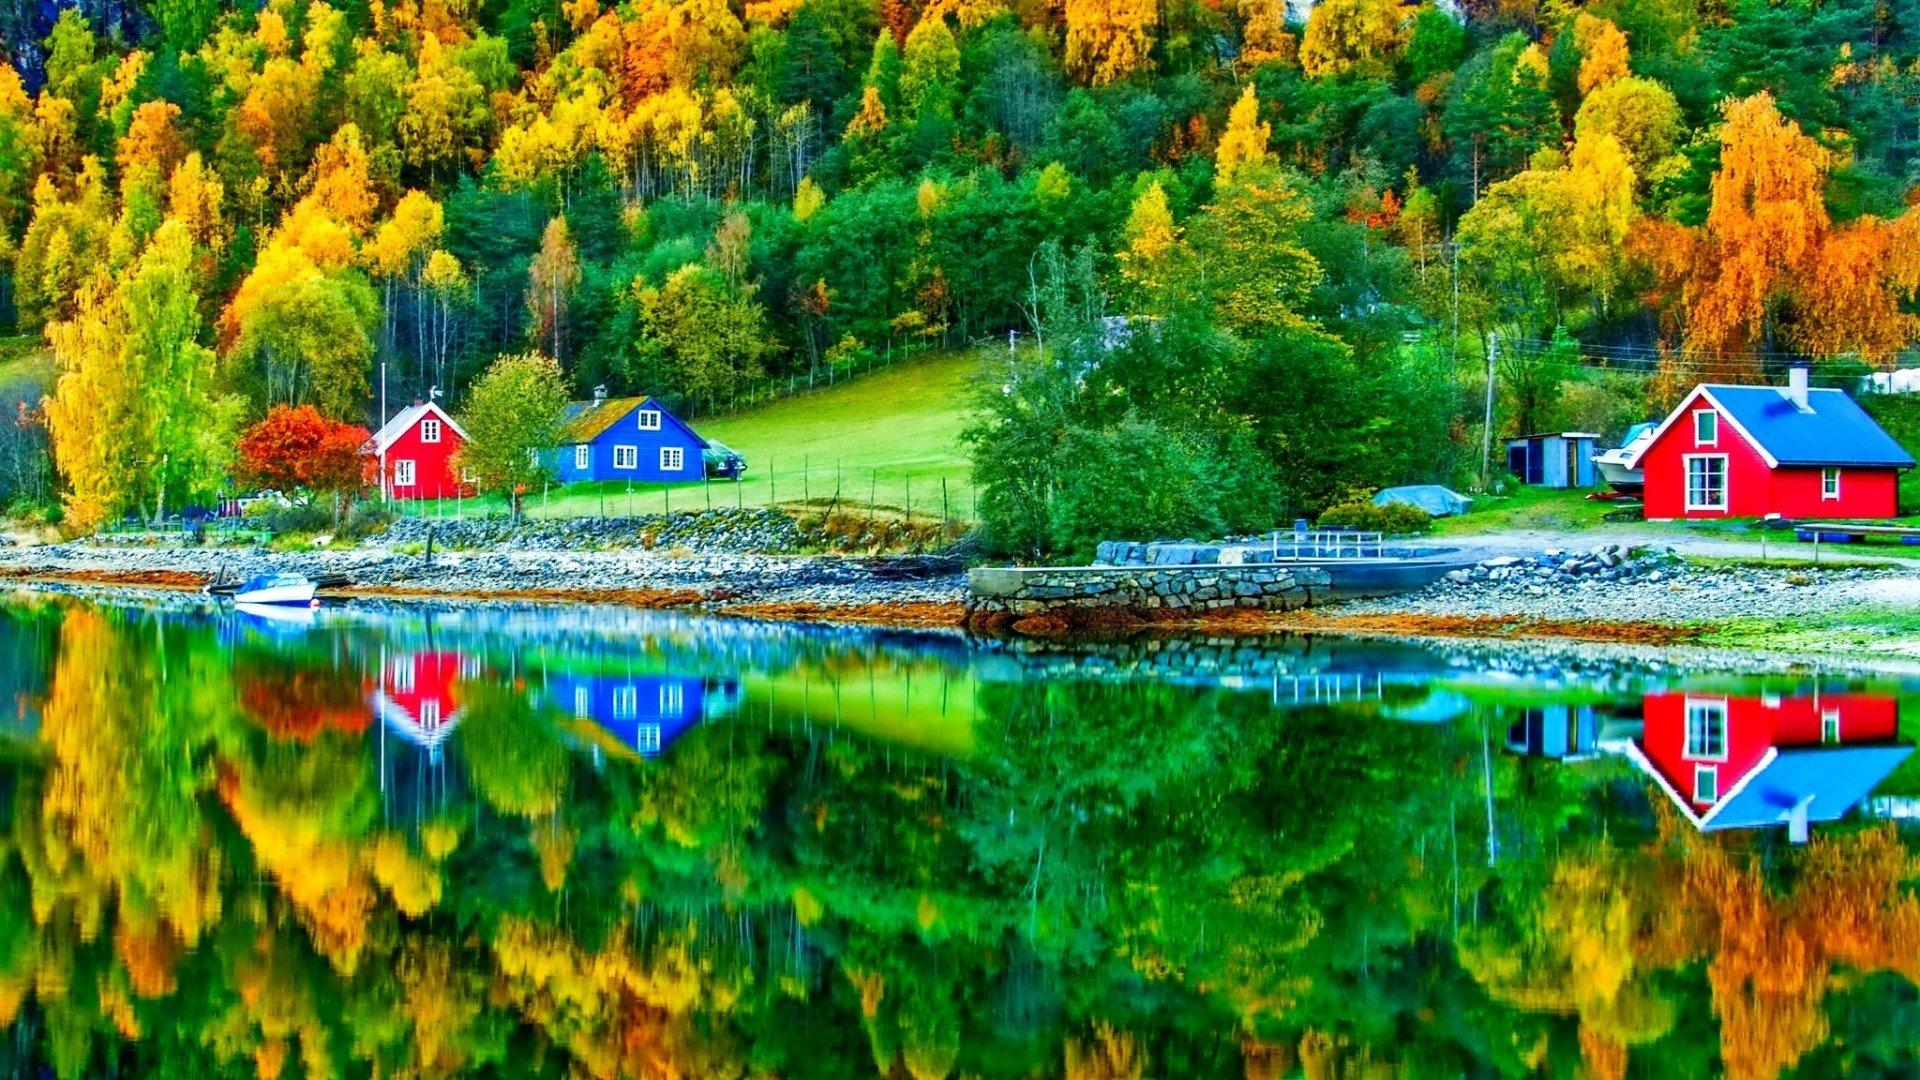 Autumn Lake Reflection HD Wallpaper   Background Image   20x20